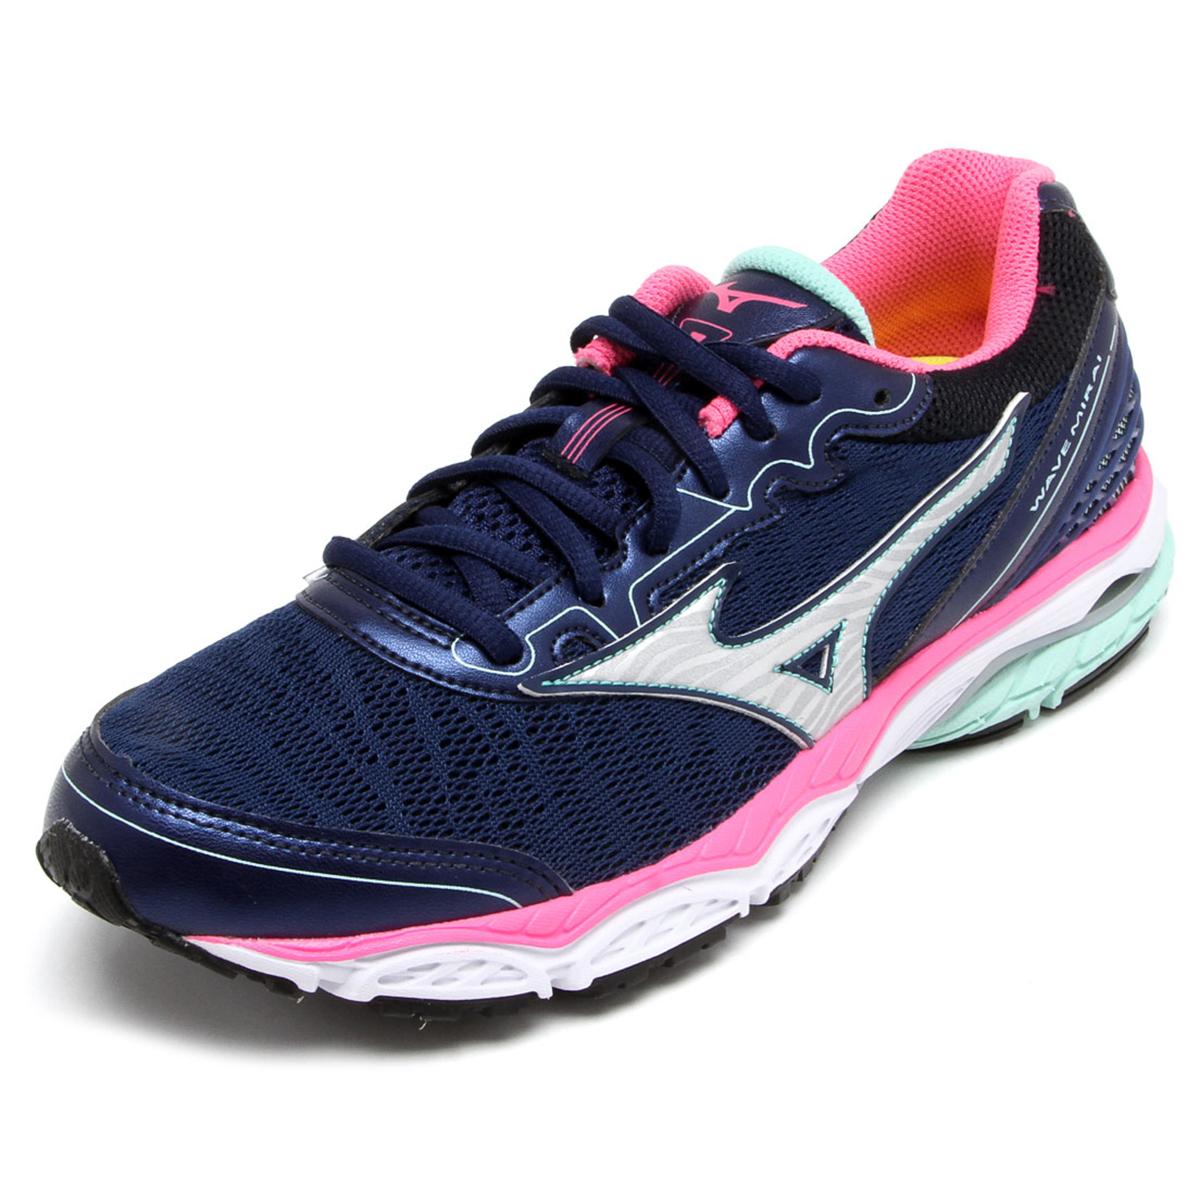 Tênis Mizuno Wave Mirai Feminino Azul e Verde - Compre Agora ... 1c0b2caf357d7